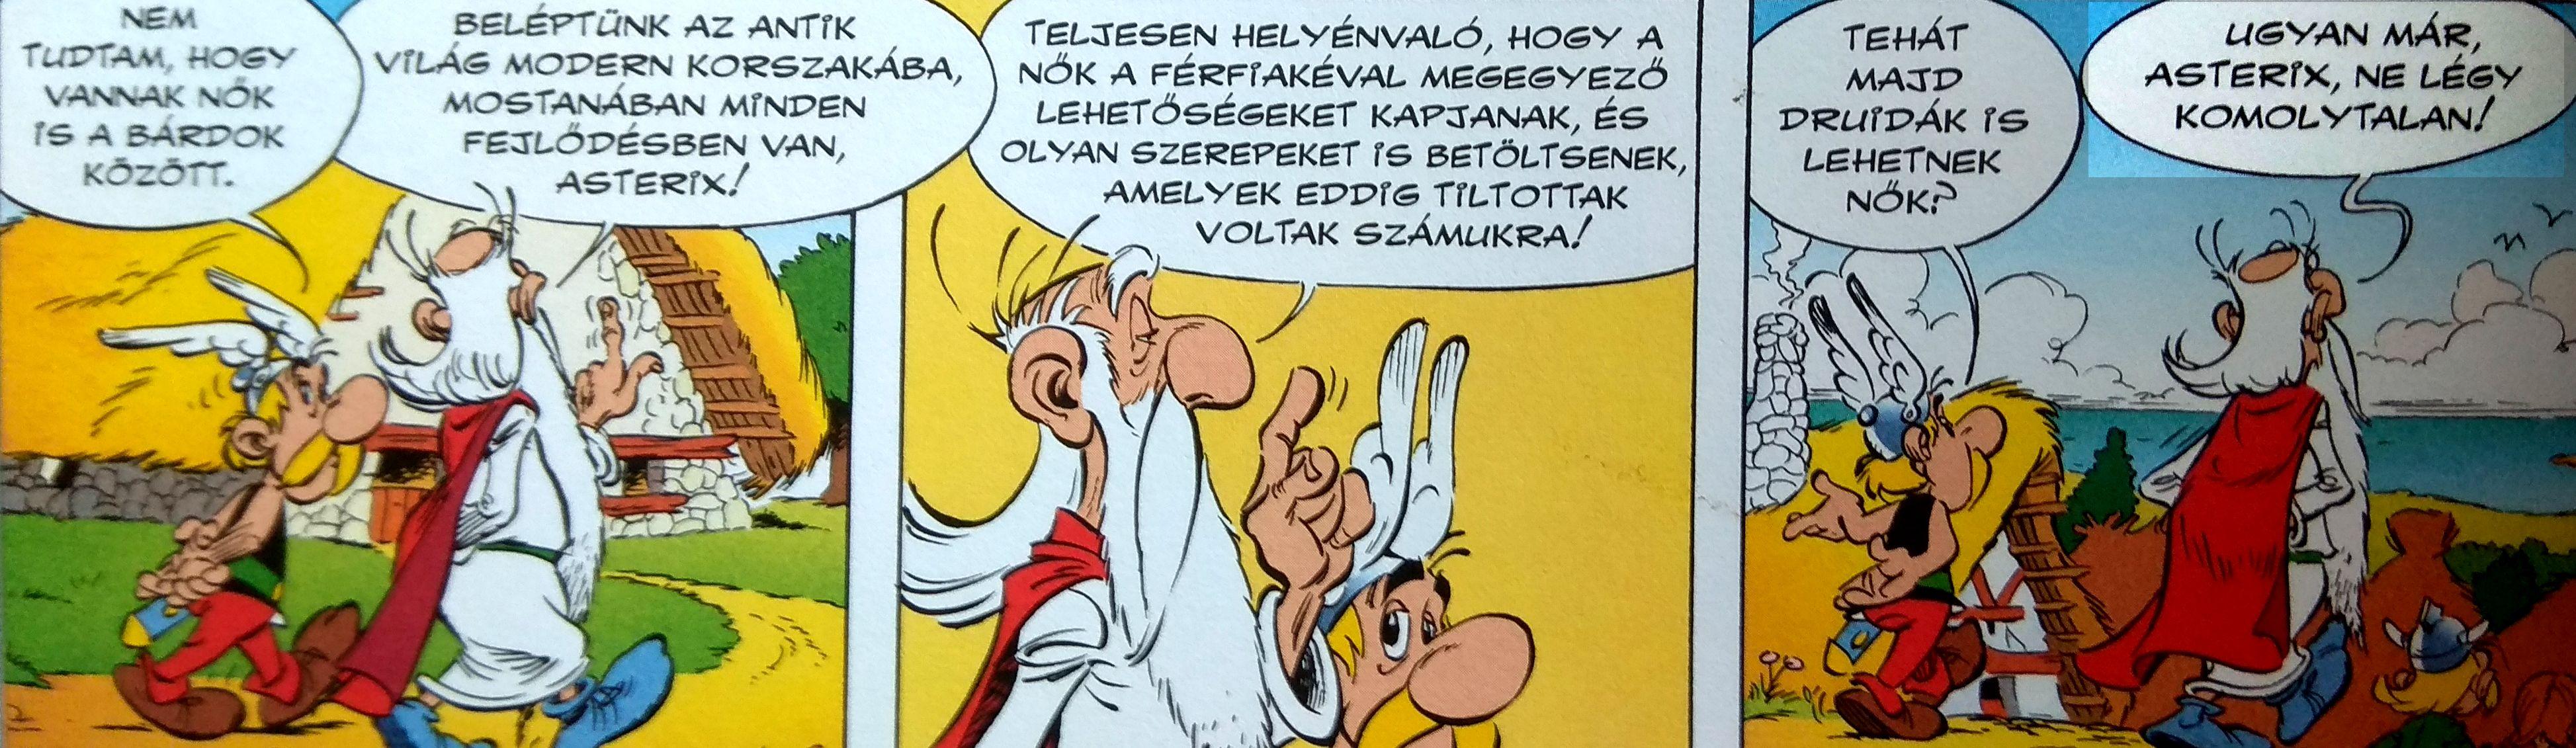 asterix_29_rozsa_es_kard_panoramix2.jpg